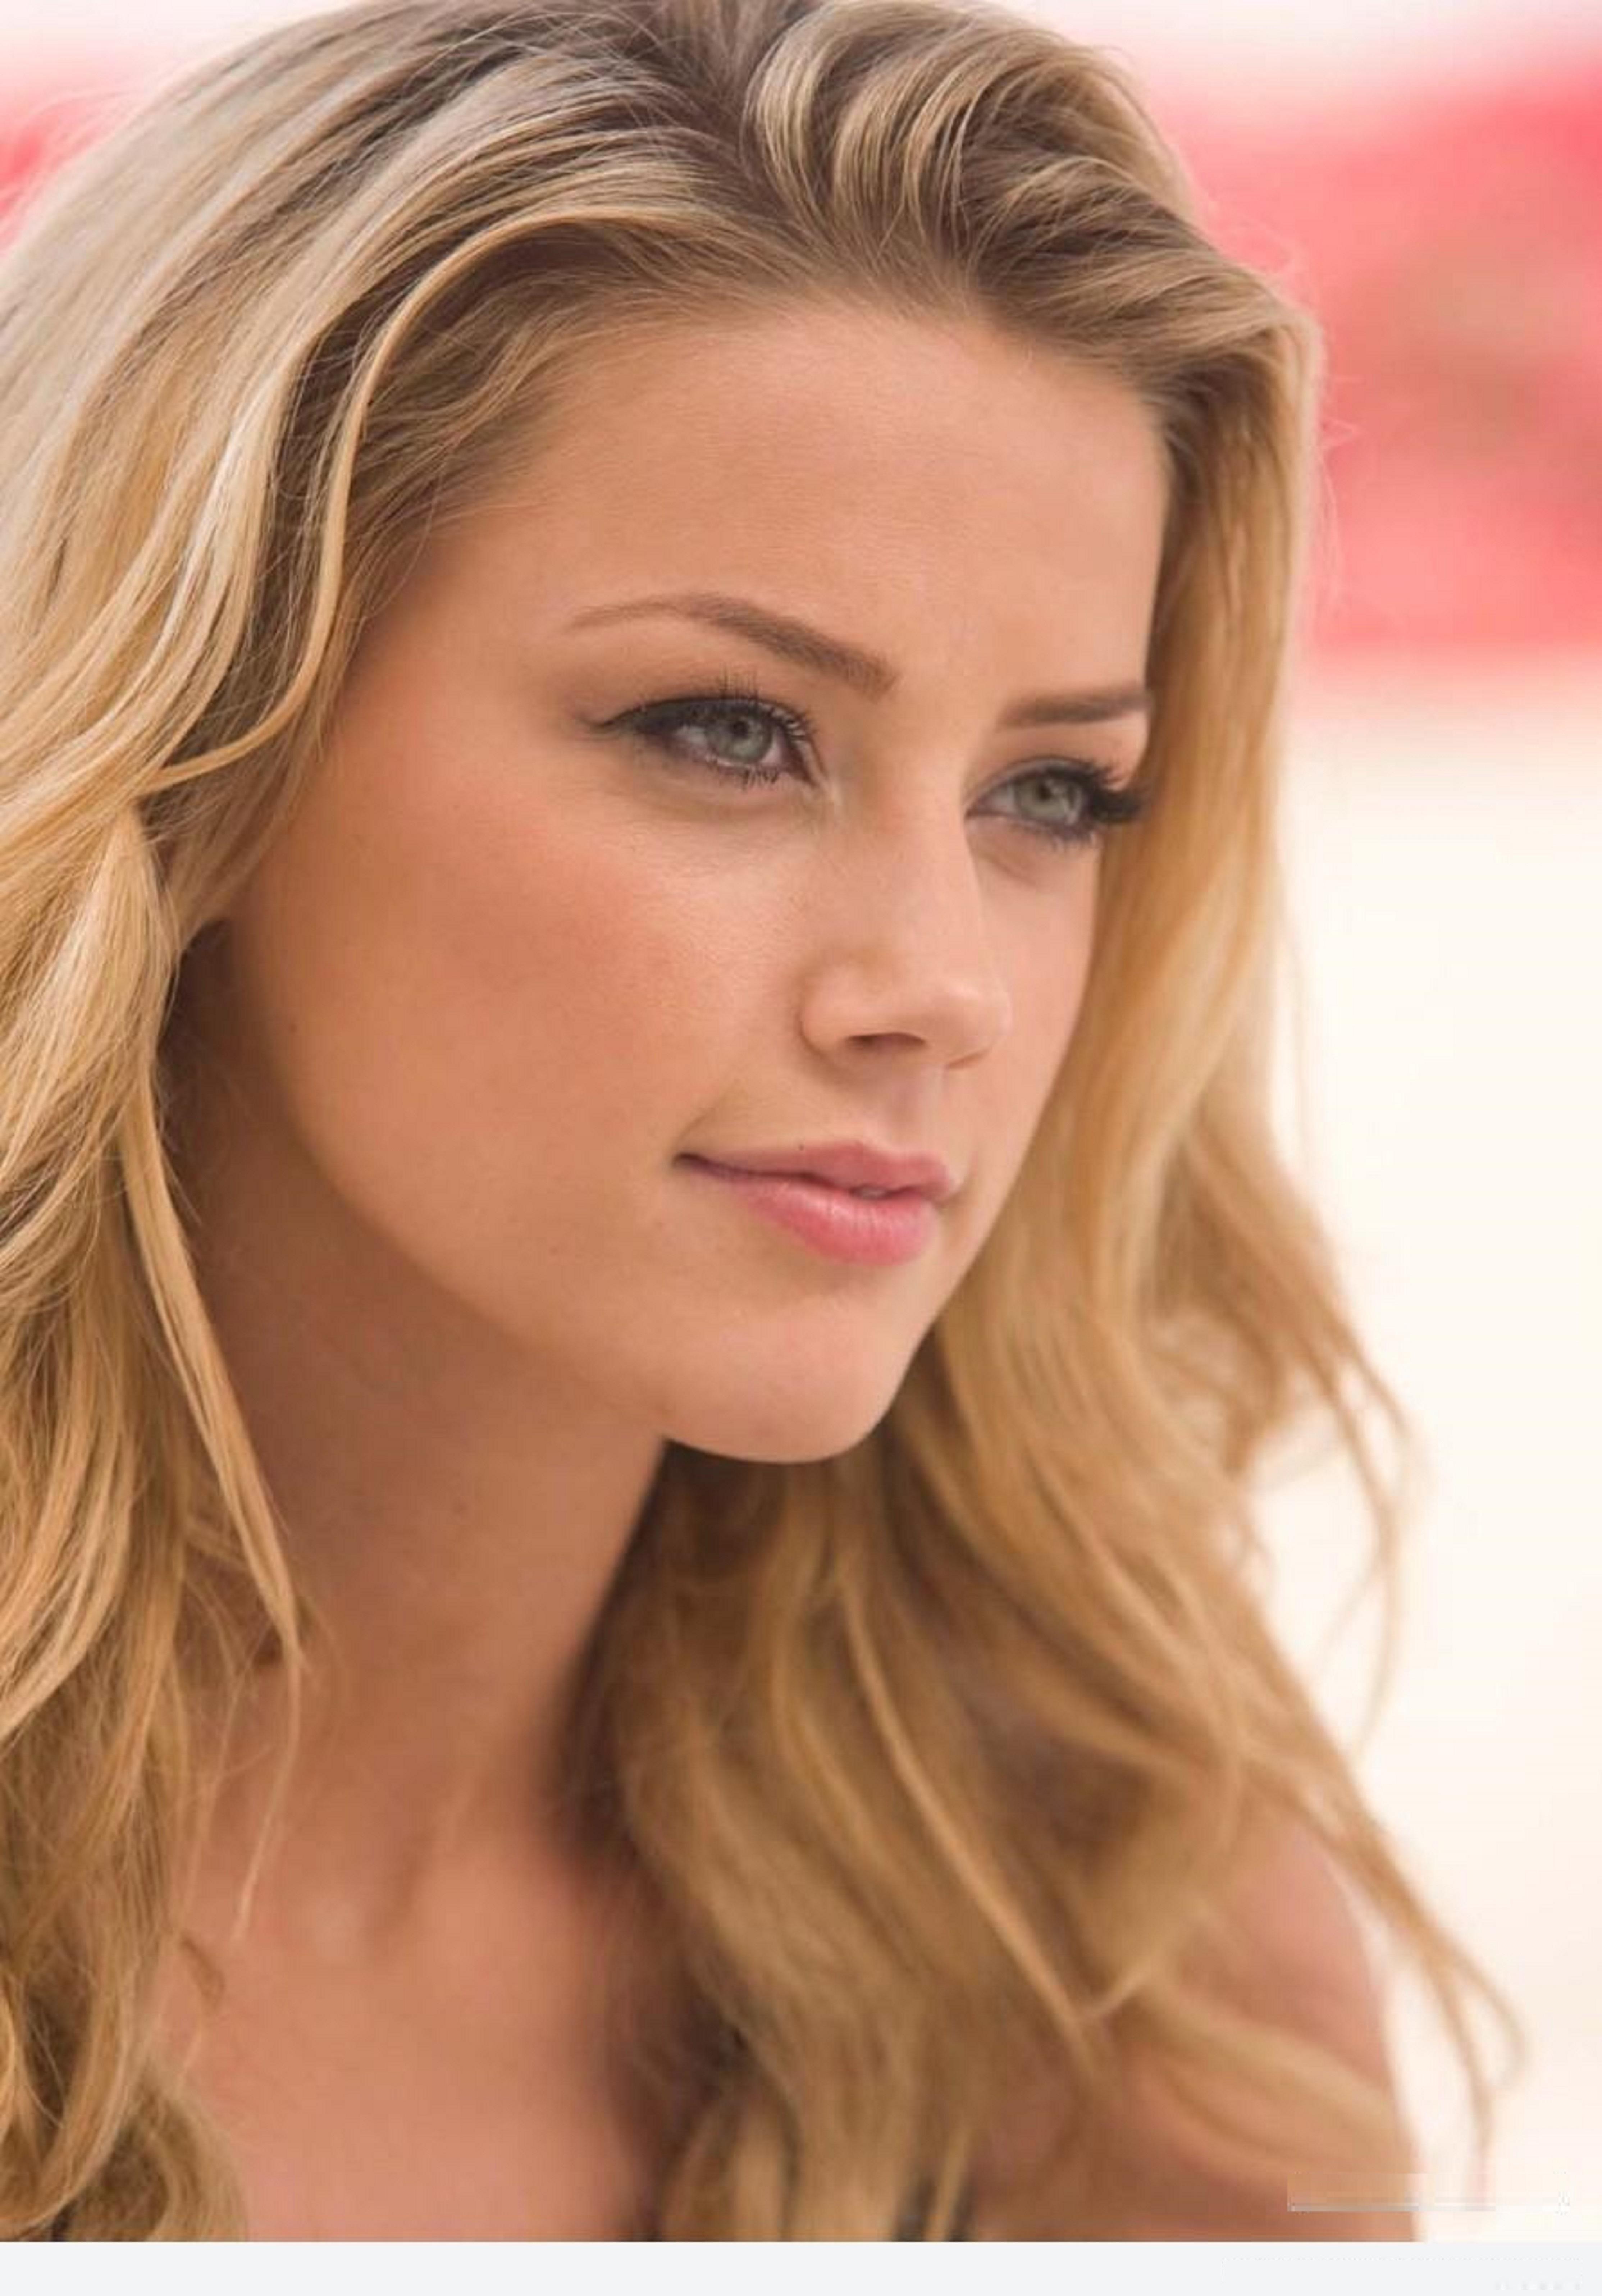 Amber Heard Charming Pics Wallpaper, HD Celebrities 4K